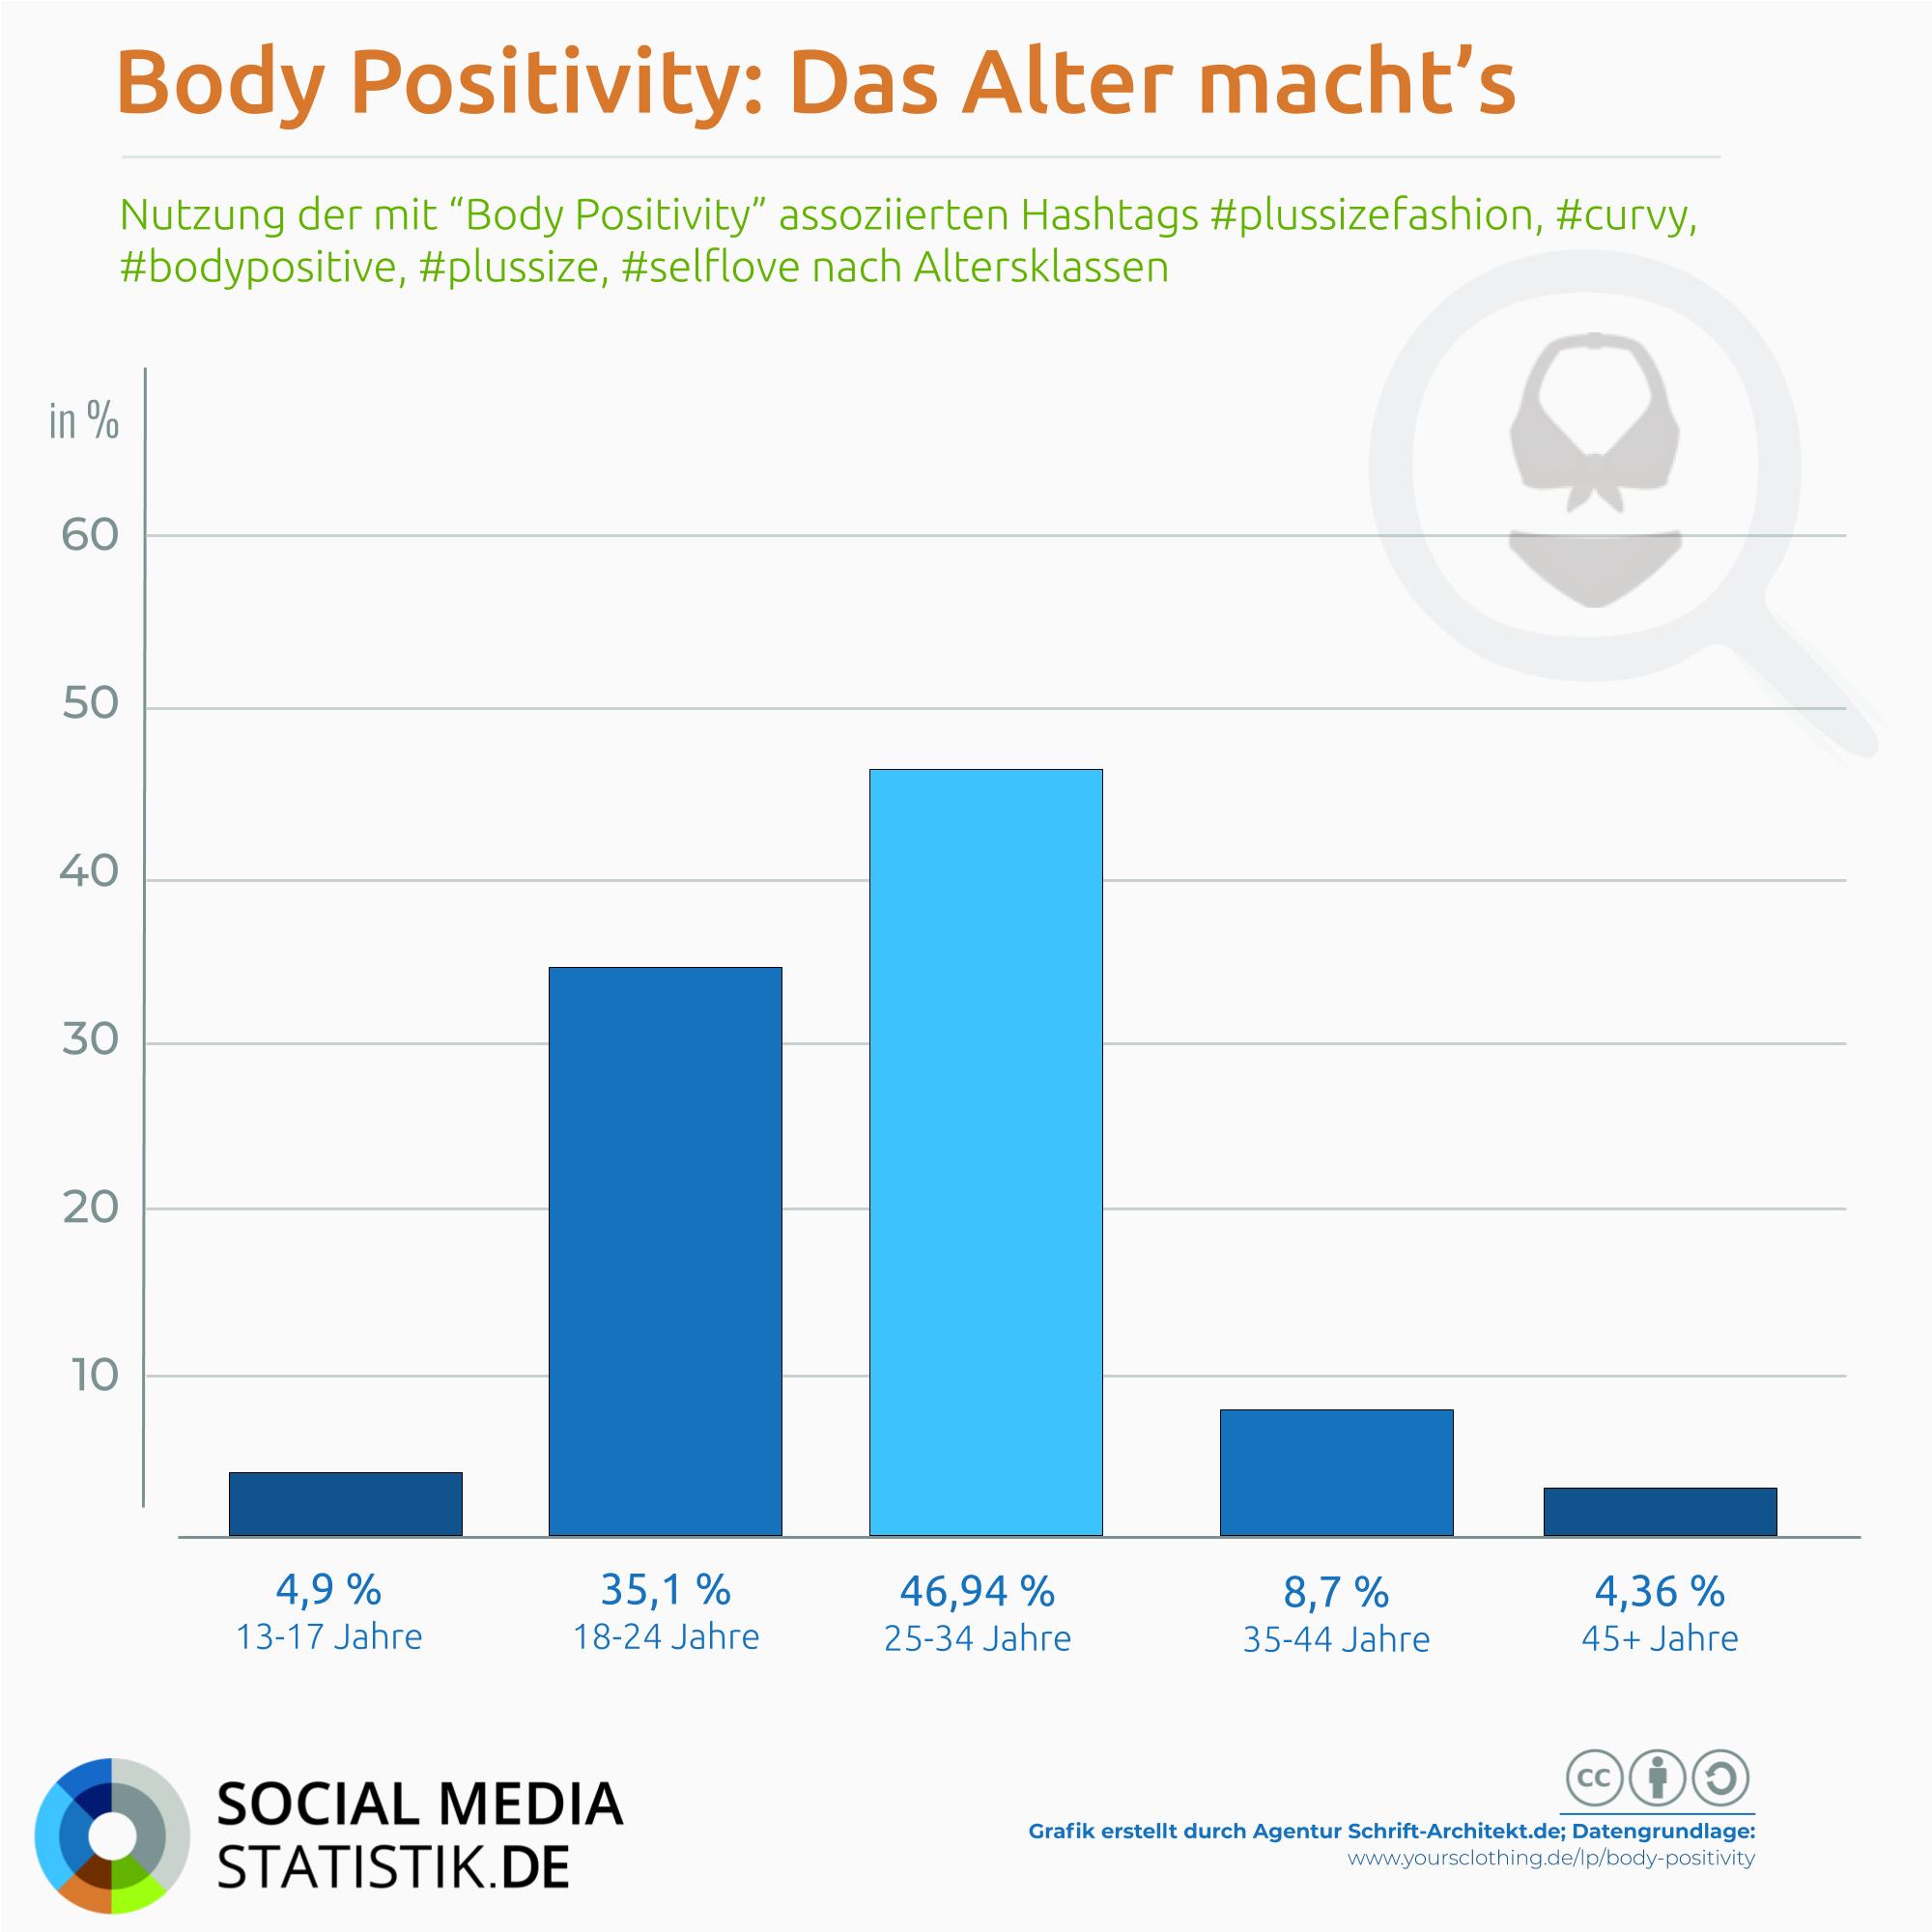 Infografik SocialMediaStatistik.de zum Thema body positivity Altersgruppen plussize selflove curvy fashion